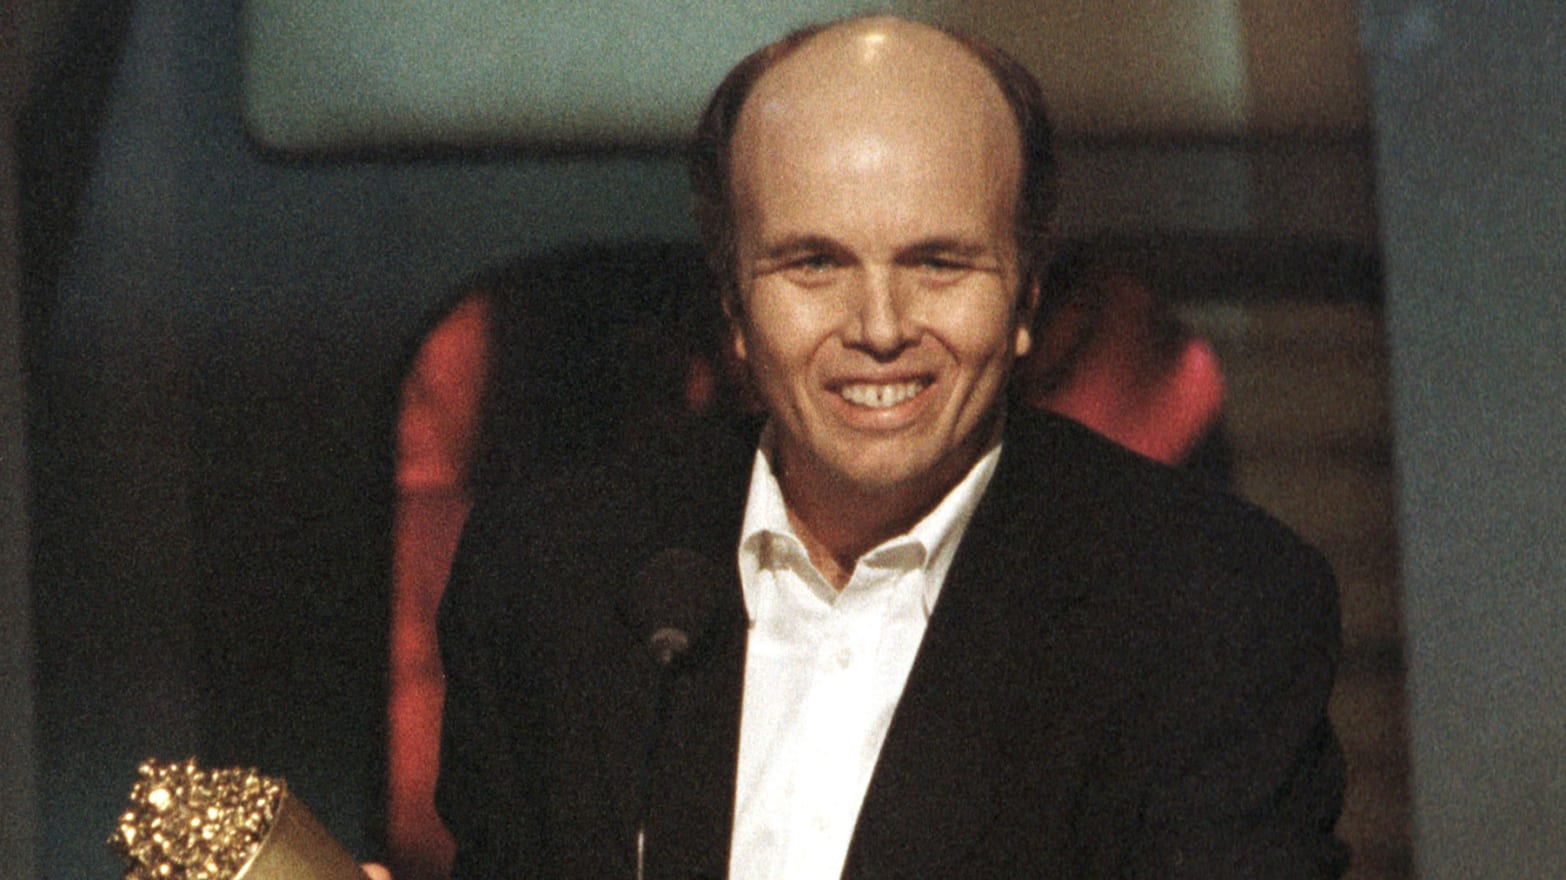 Clint Howard face